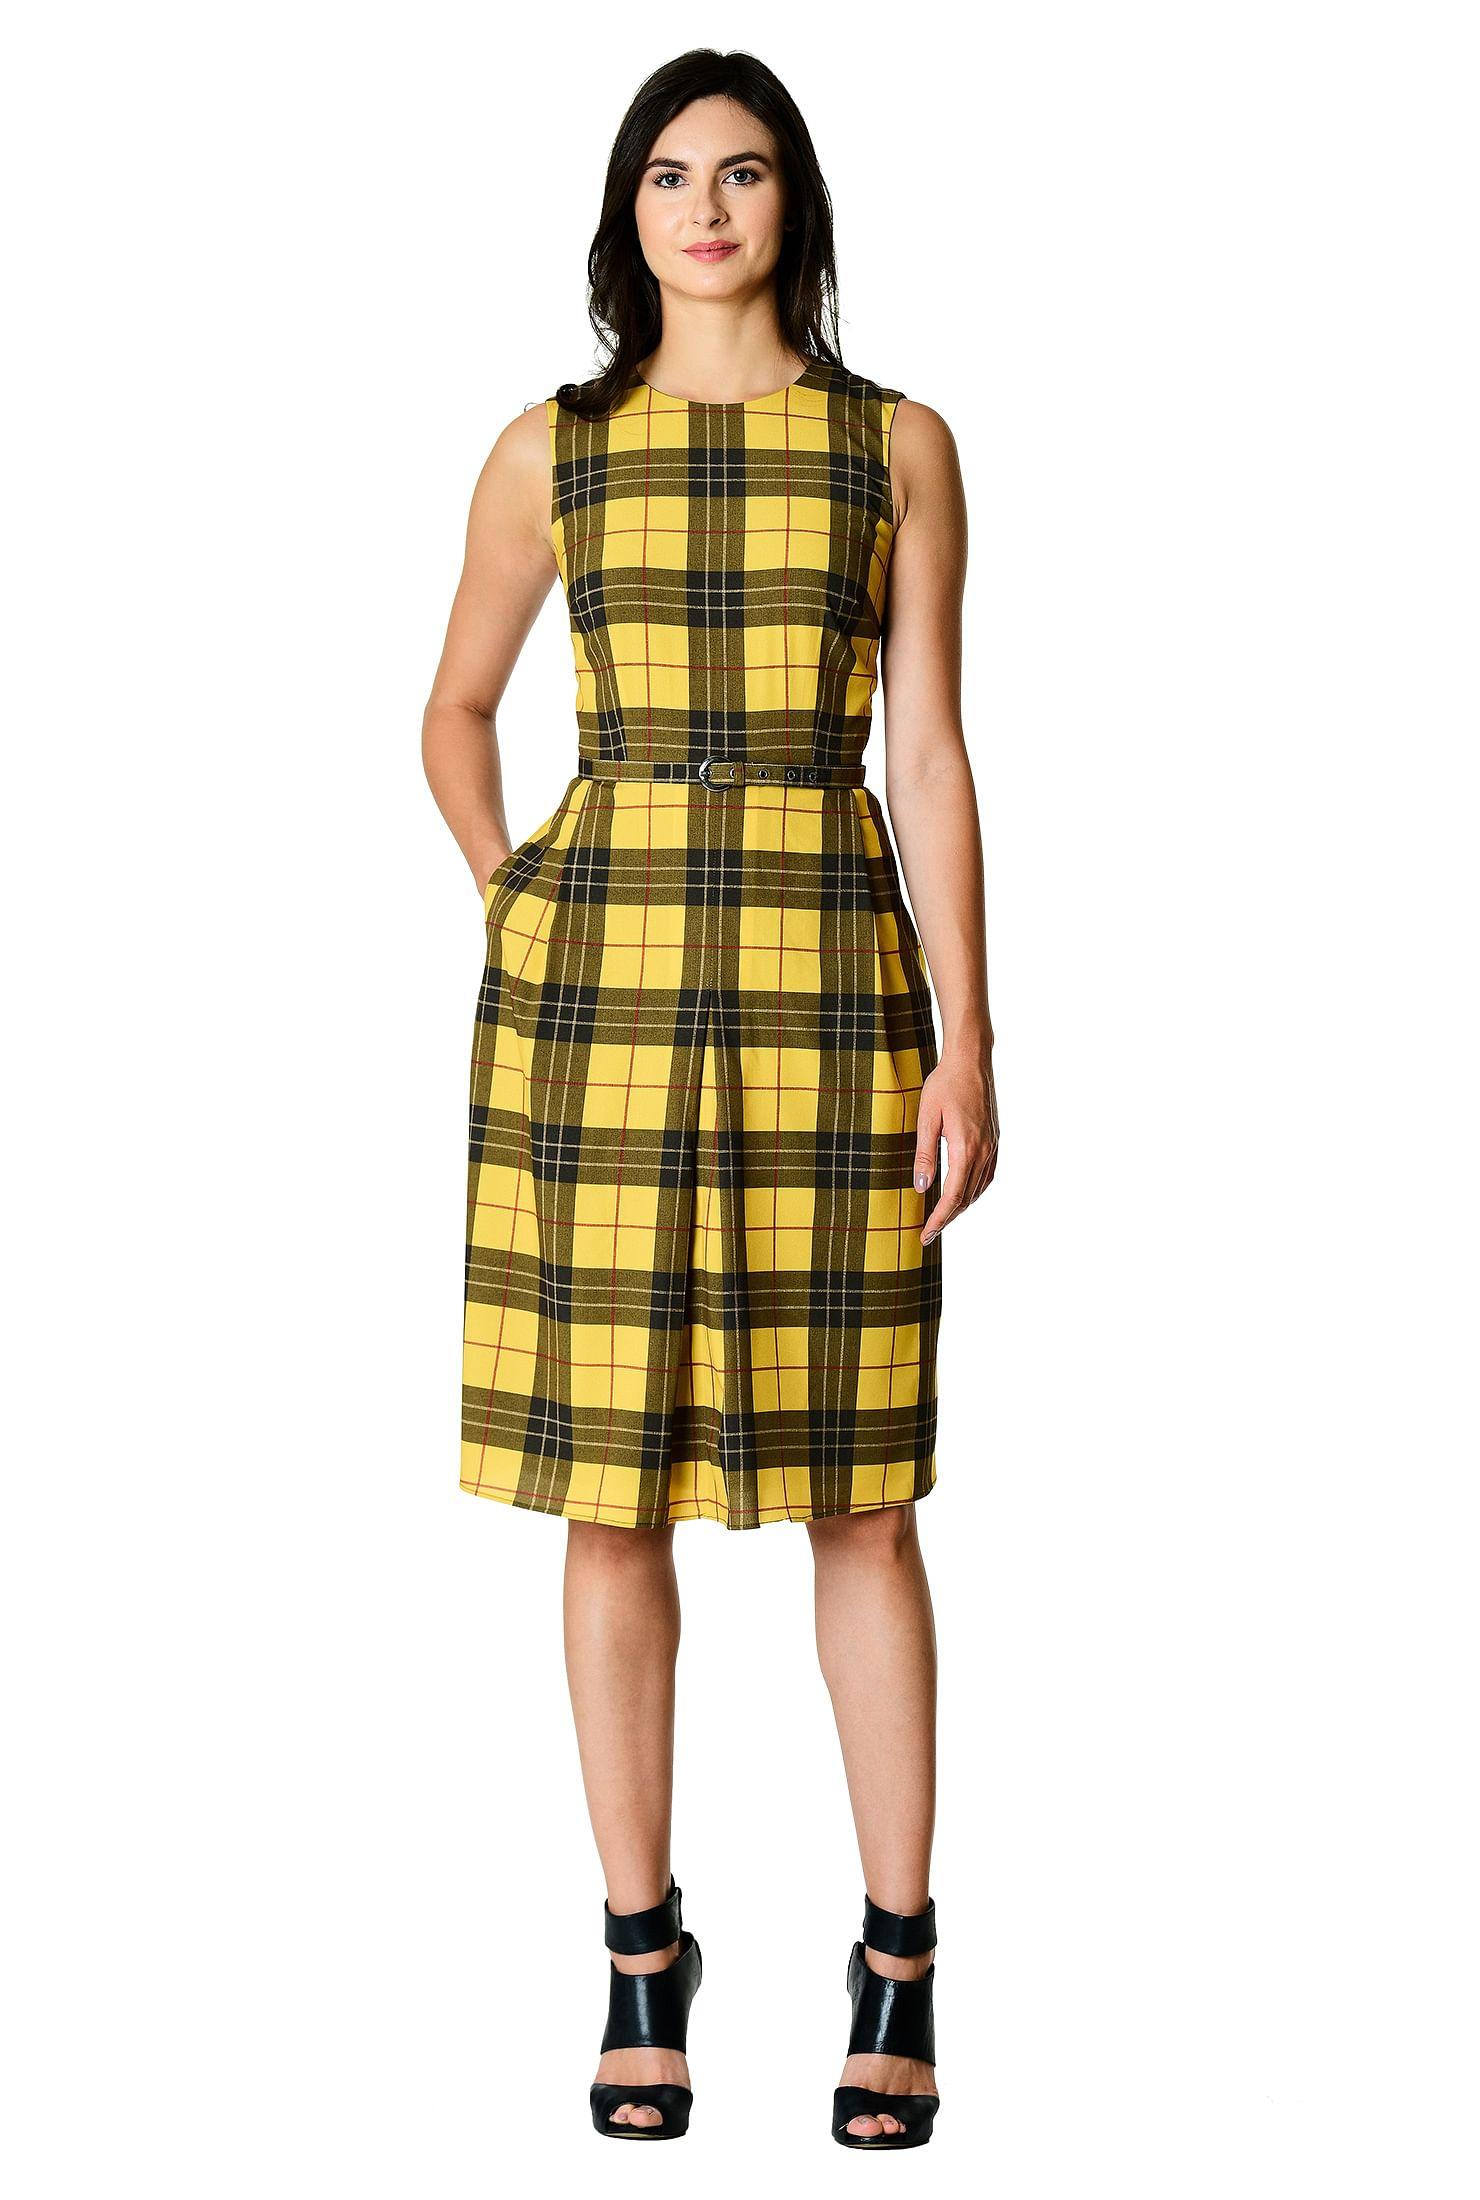 ed9a88e85392d back zip dresses, below knee length dresses, Check Print Dresses, fit-